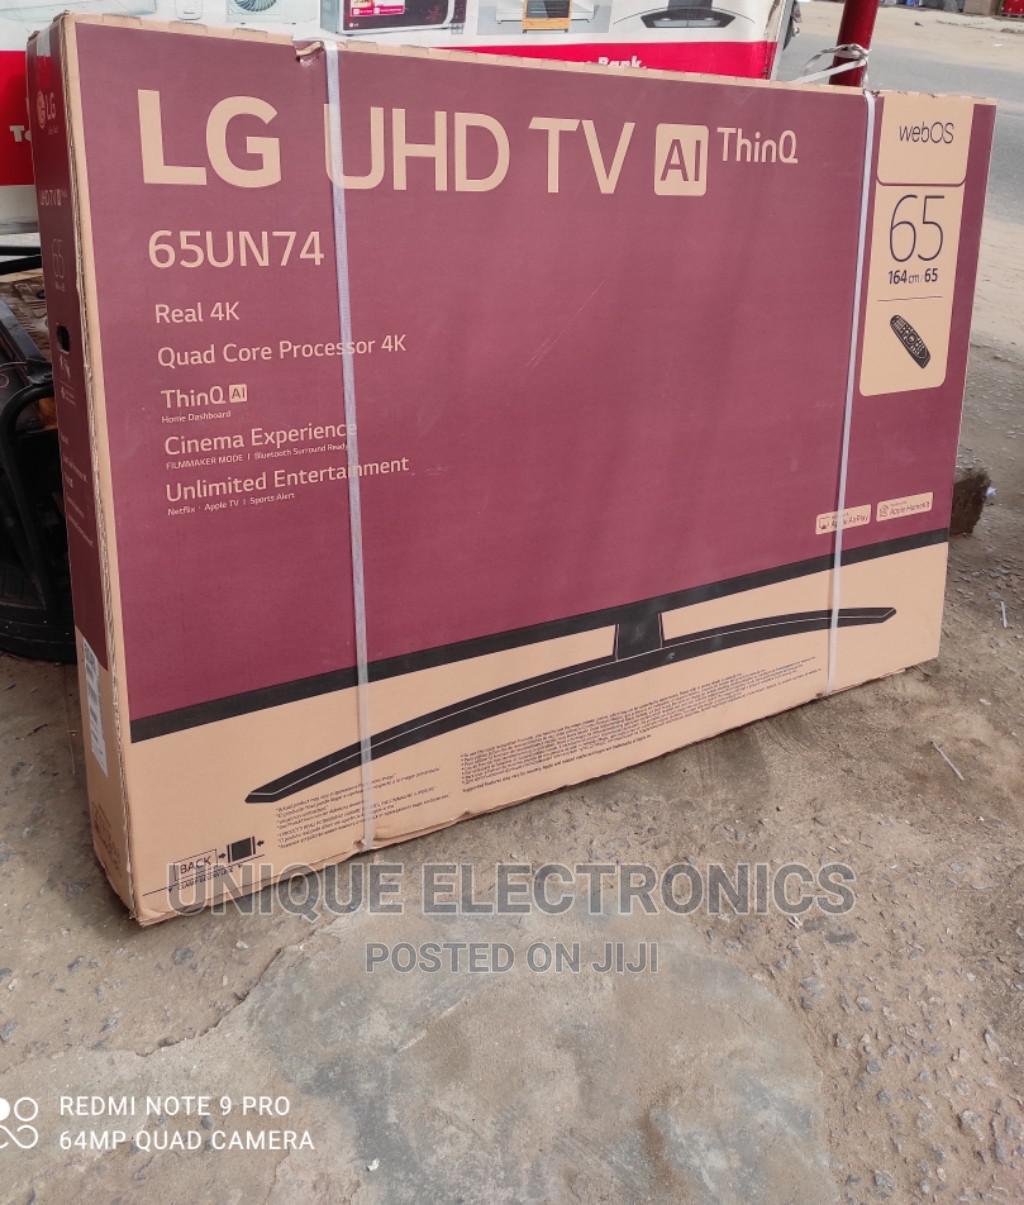 LG 65 Inches( Korea )Rear 4K UHD Smart (Magic Remote)+Wi-Fi